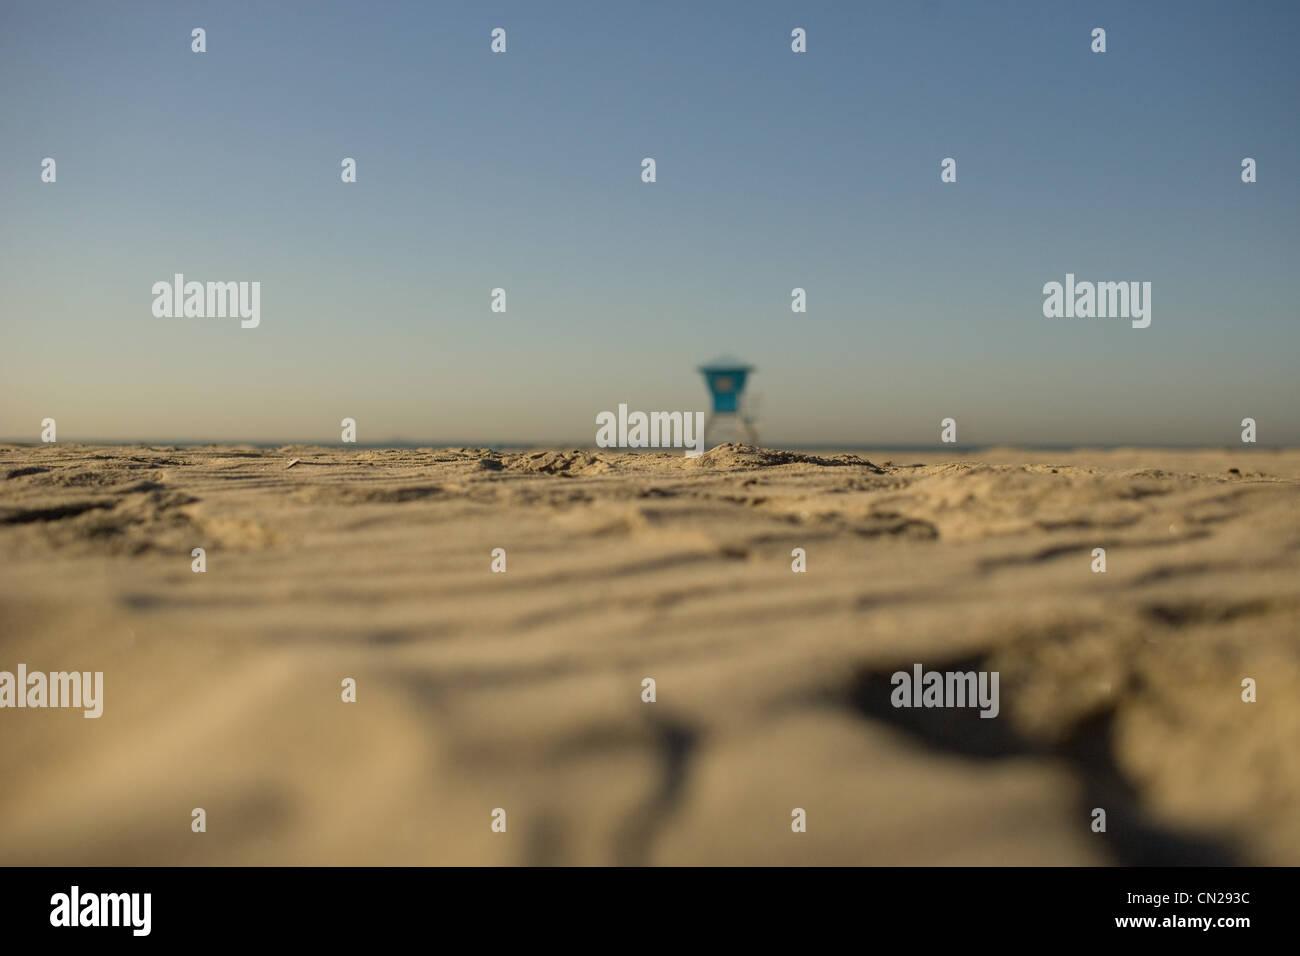 Fernen Rettungsschwimmer-Turm am Sandstrand Stockbild